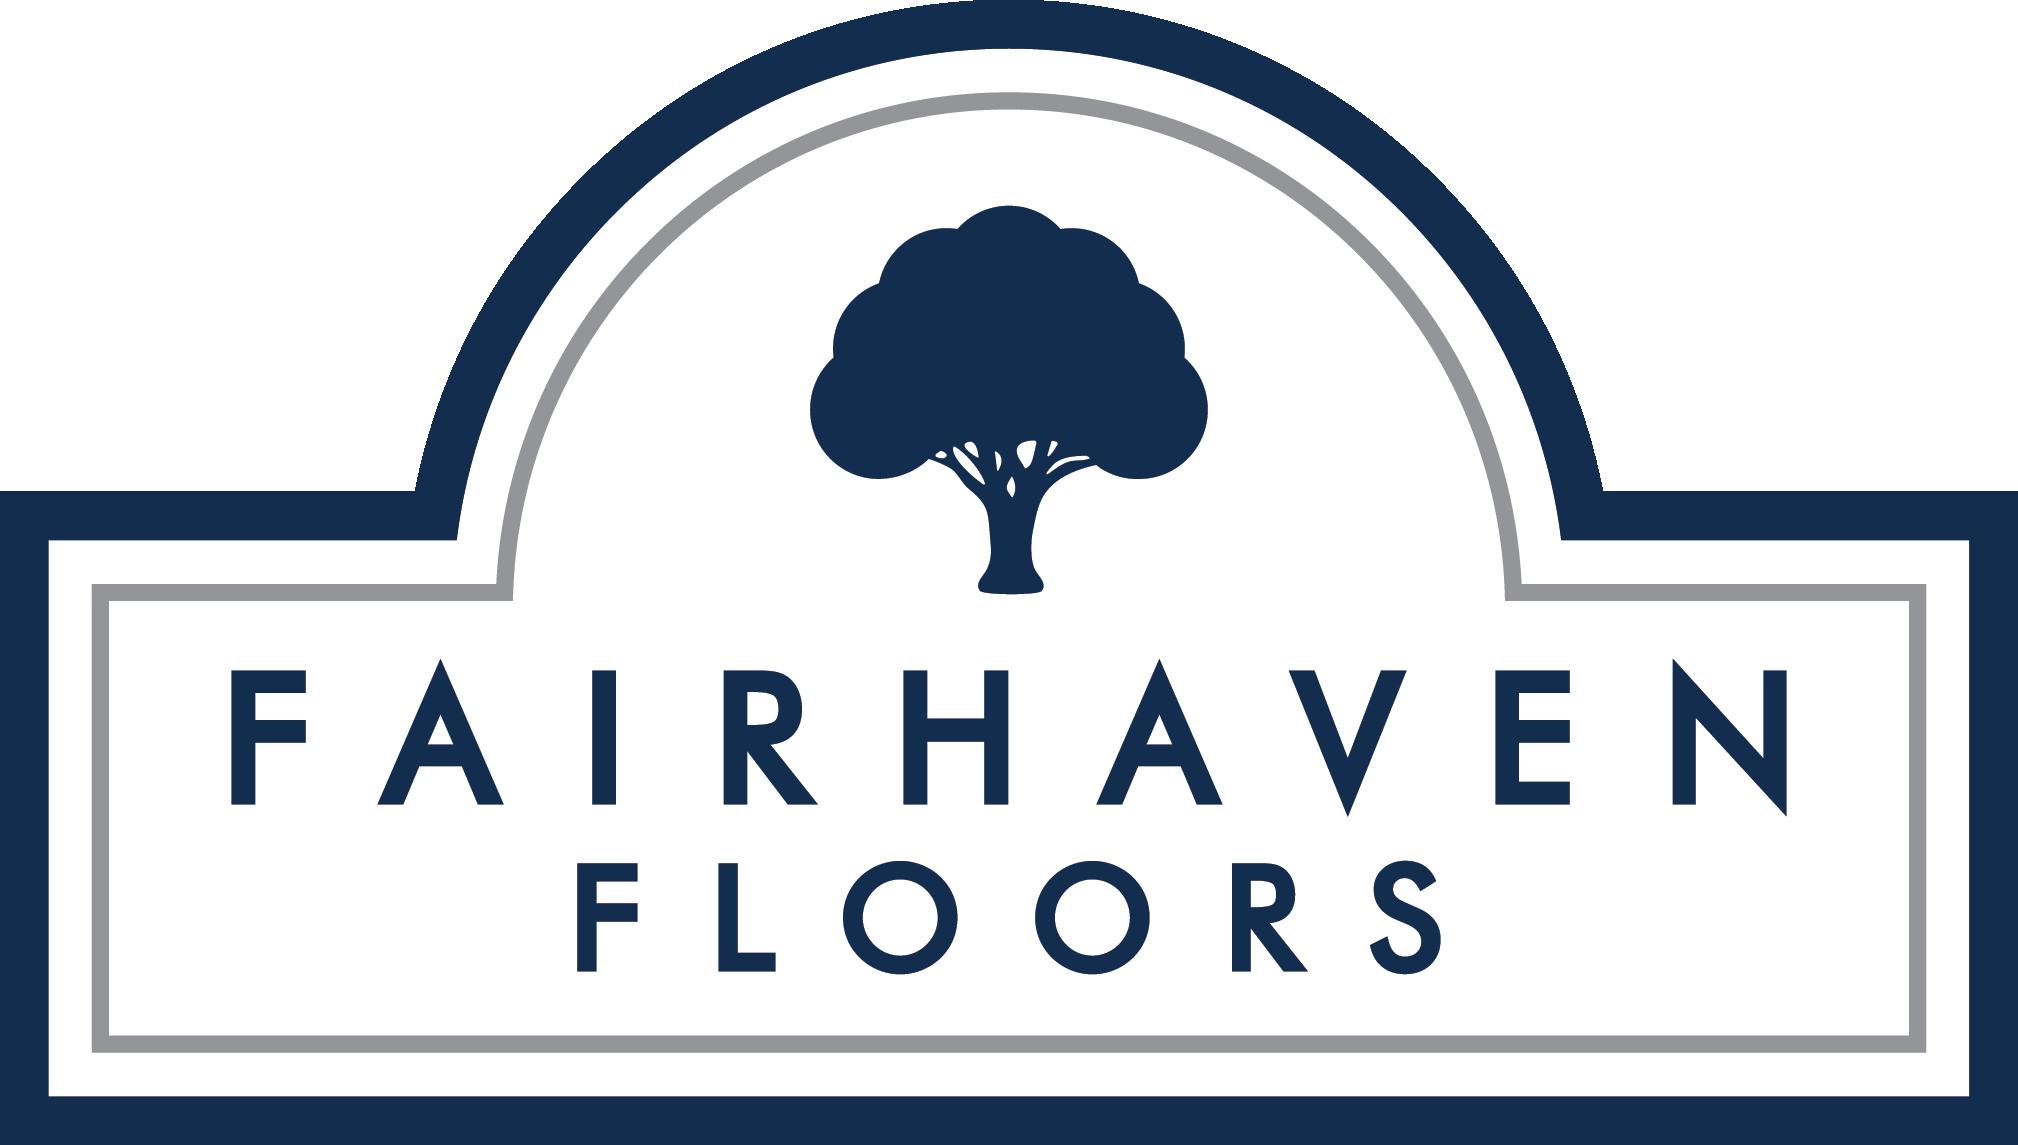 Fairhaven Floors